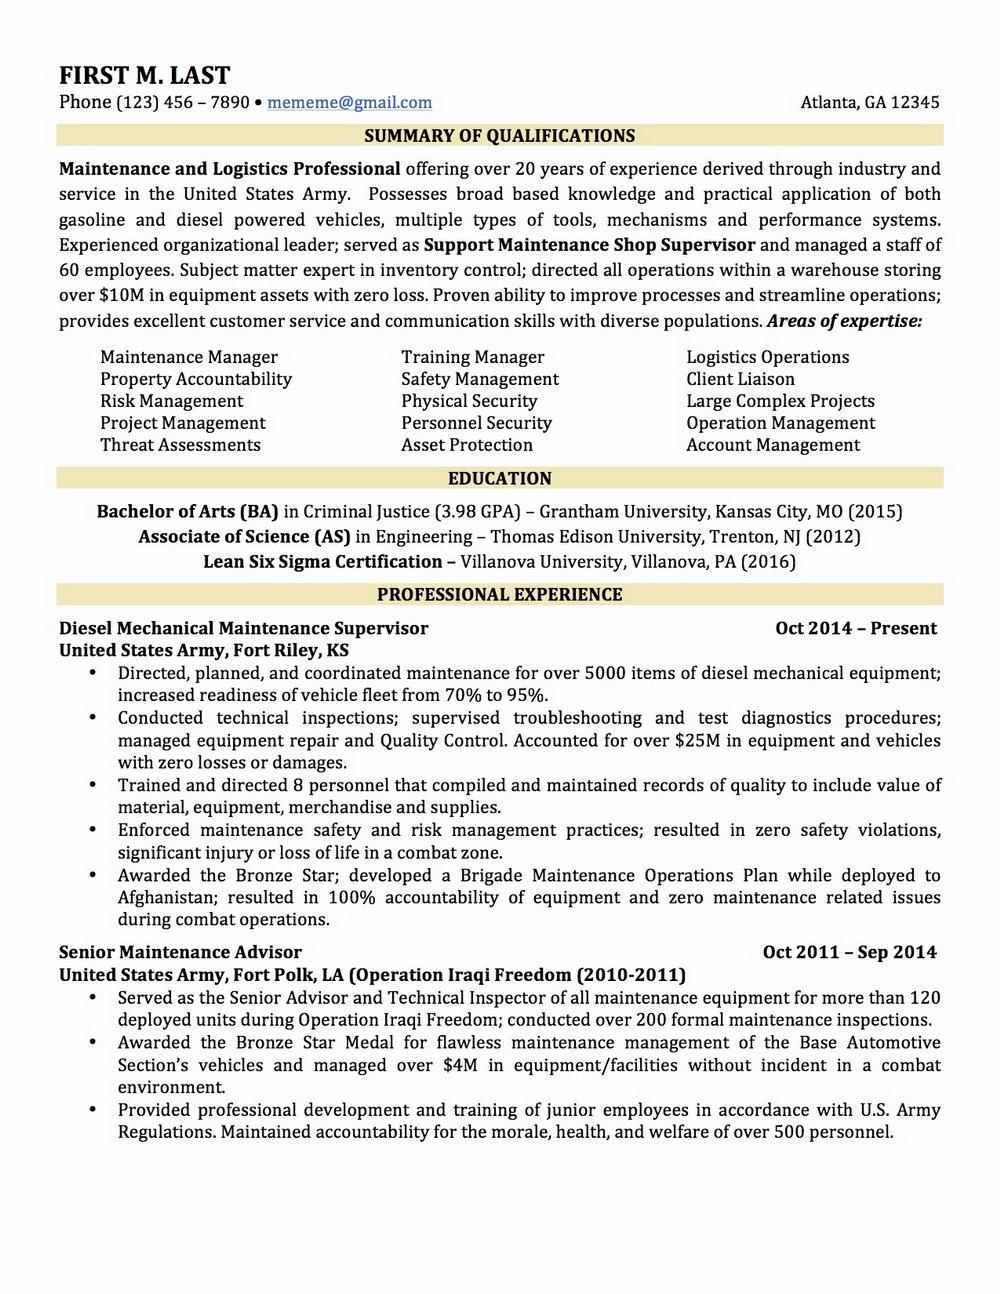 Military To Civilian Resume Translation